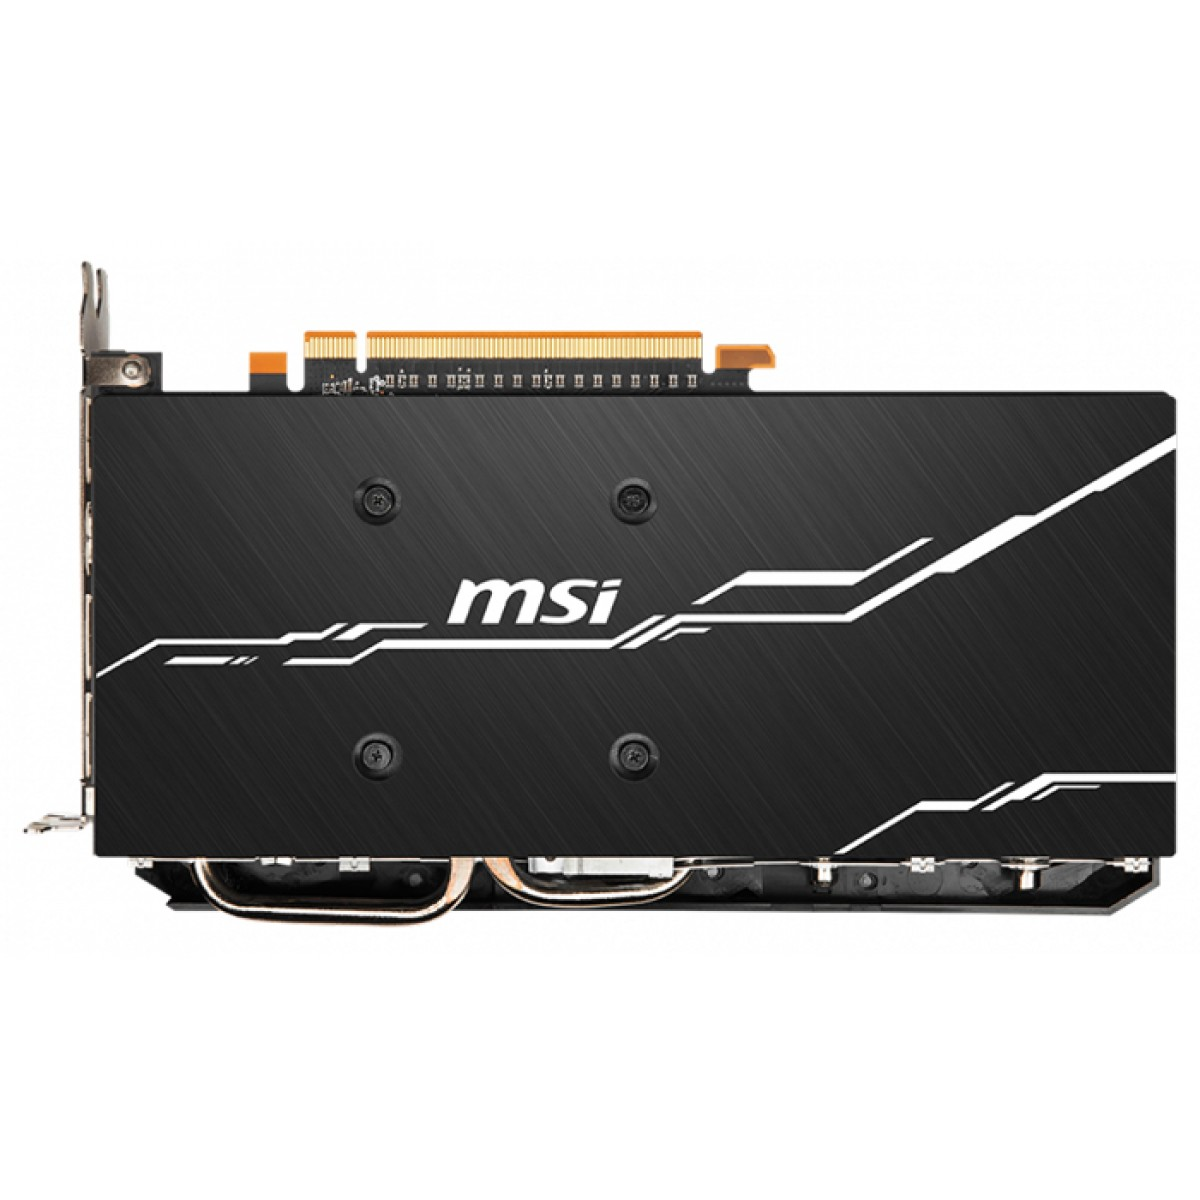 Placa de Vídeo MSI Radeon Navi RX 5700 XT Mech OC Dual, 8GB GDDR6, 256Bit, RX 5700XT MECH OC